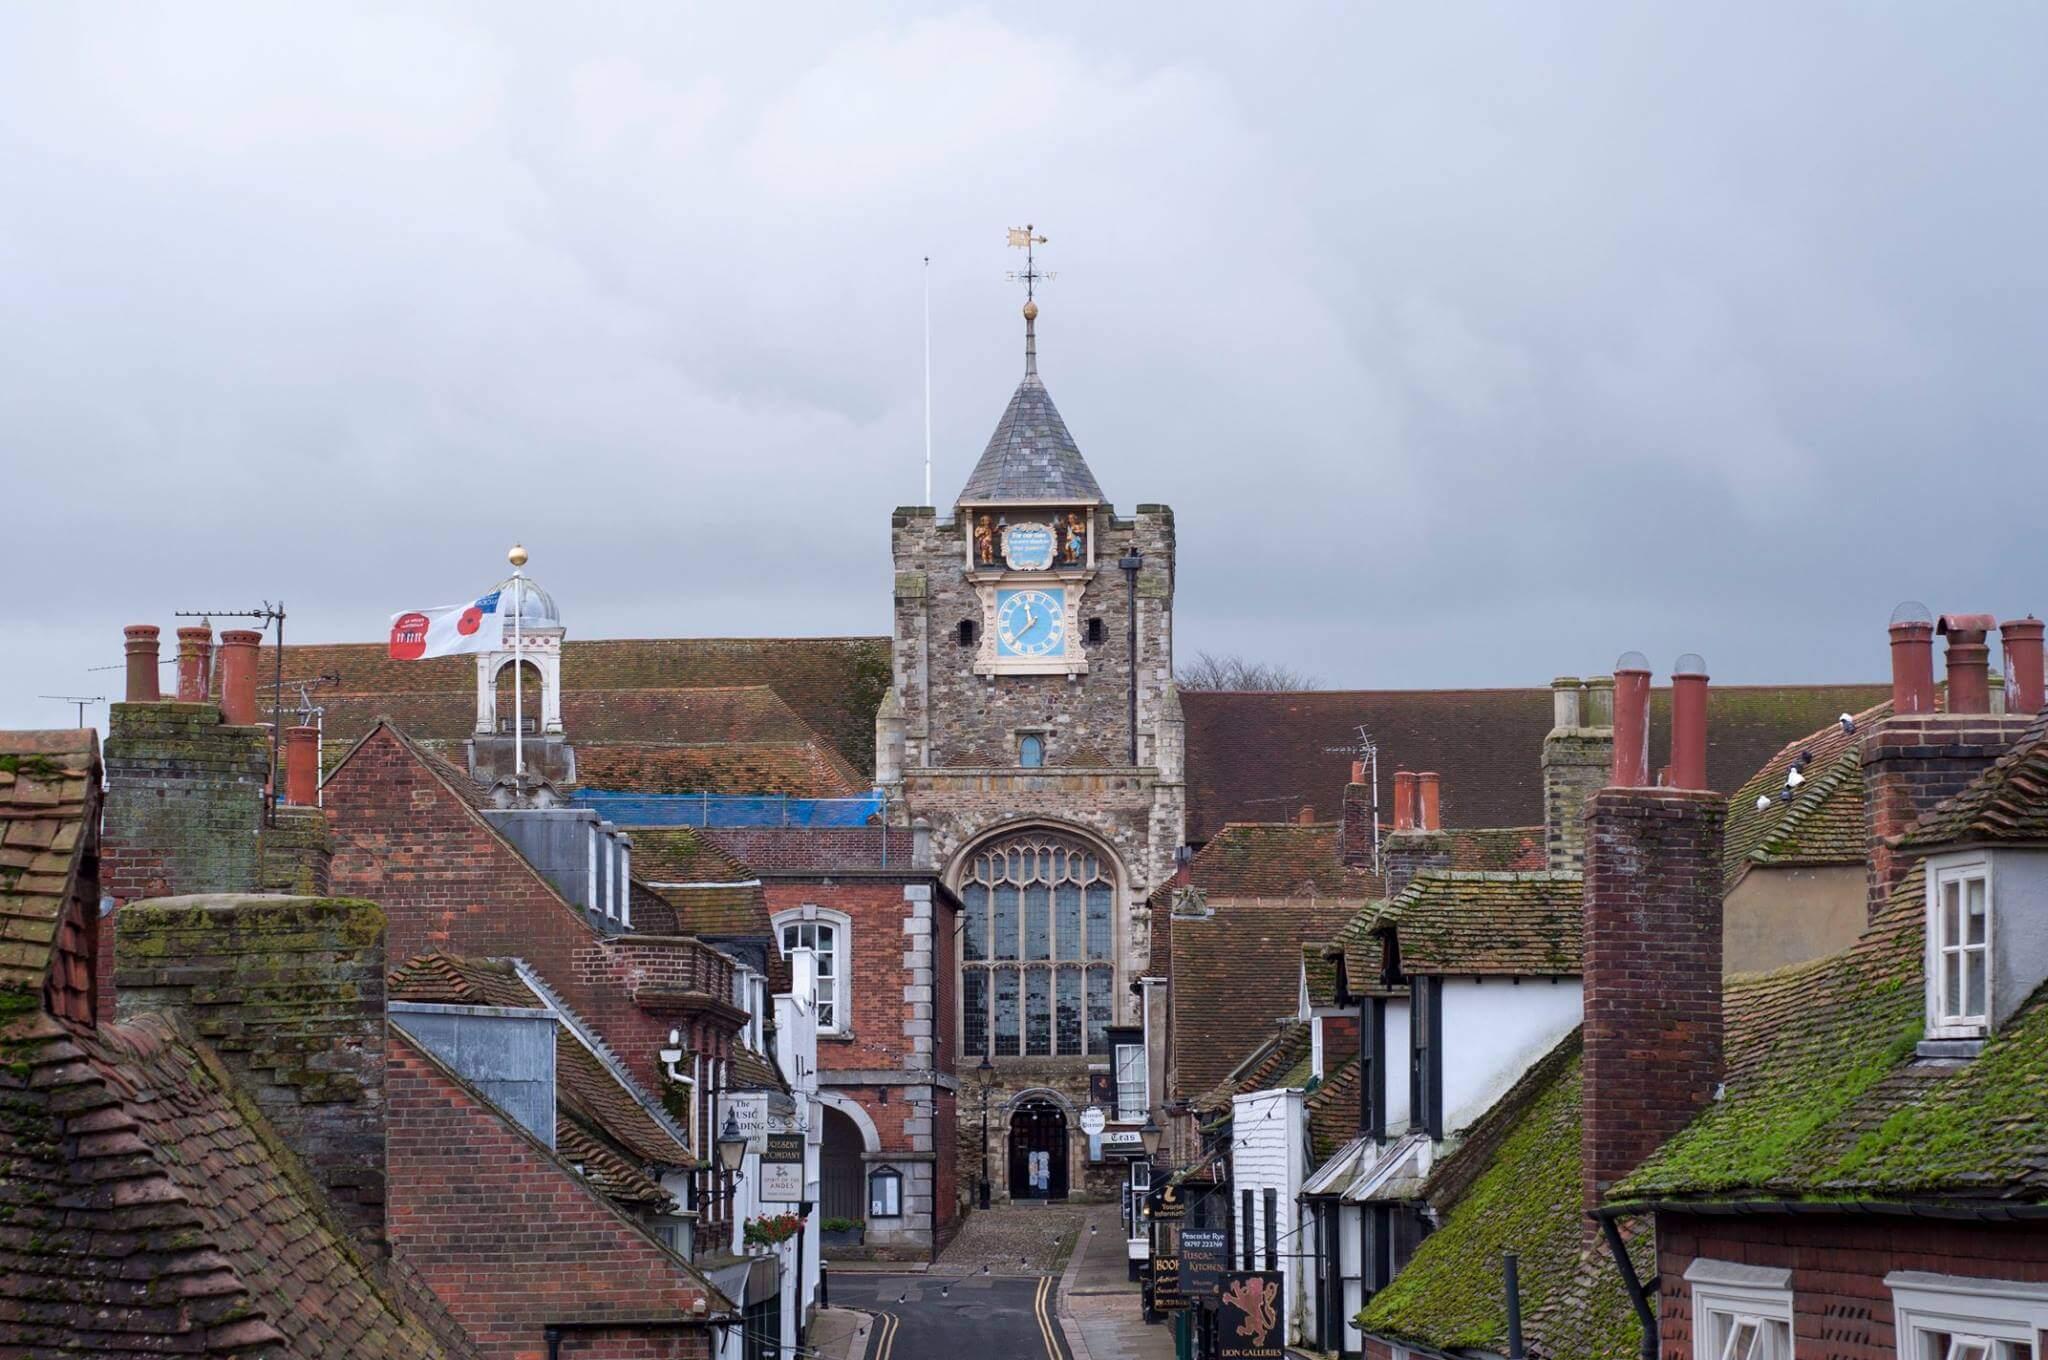 Medieval history in Rye